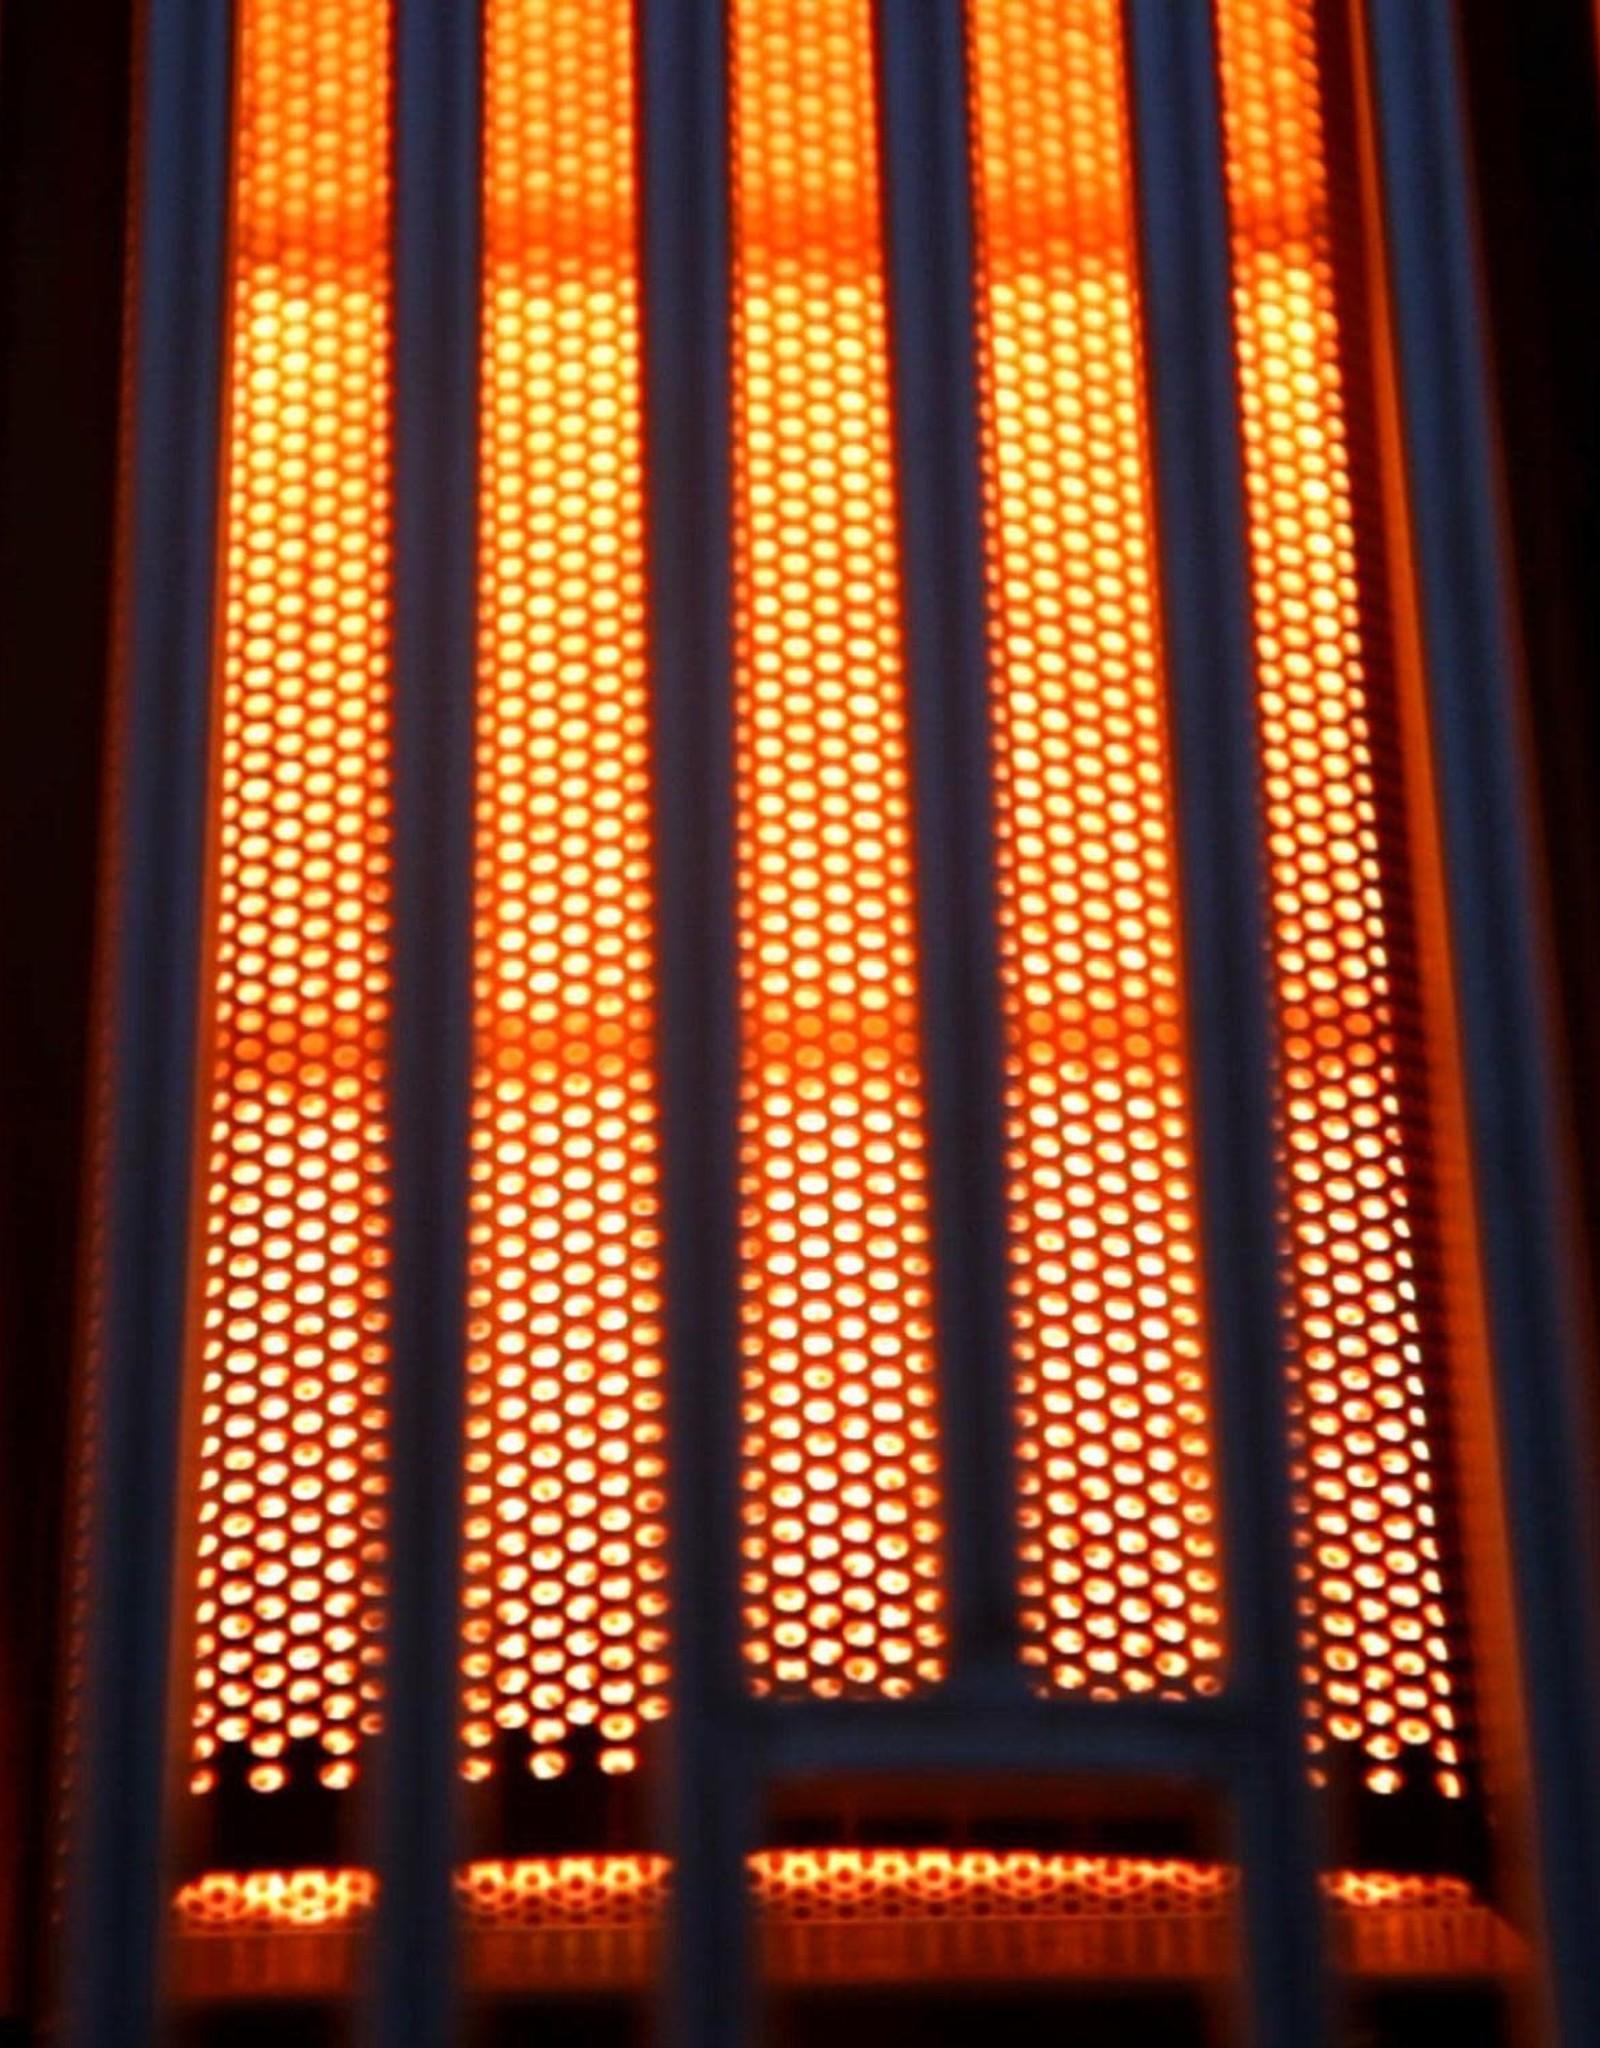 Blaze Outdoor Products Blaze Infrared Searing Burner - BLZ-IRN